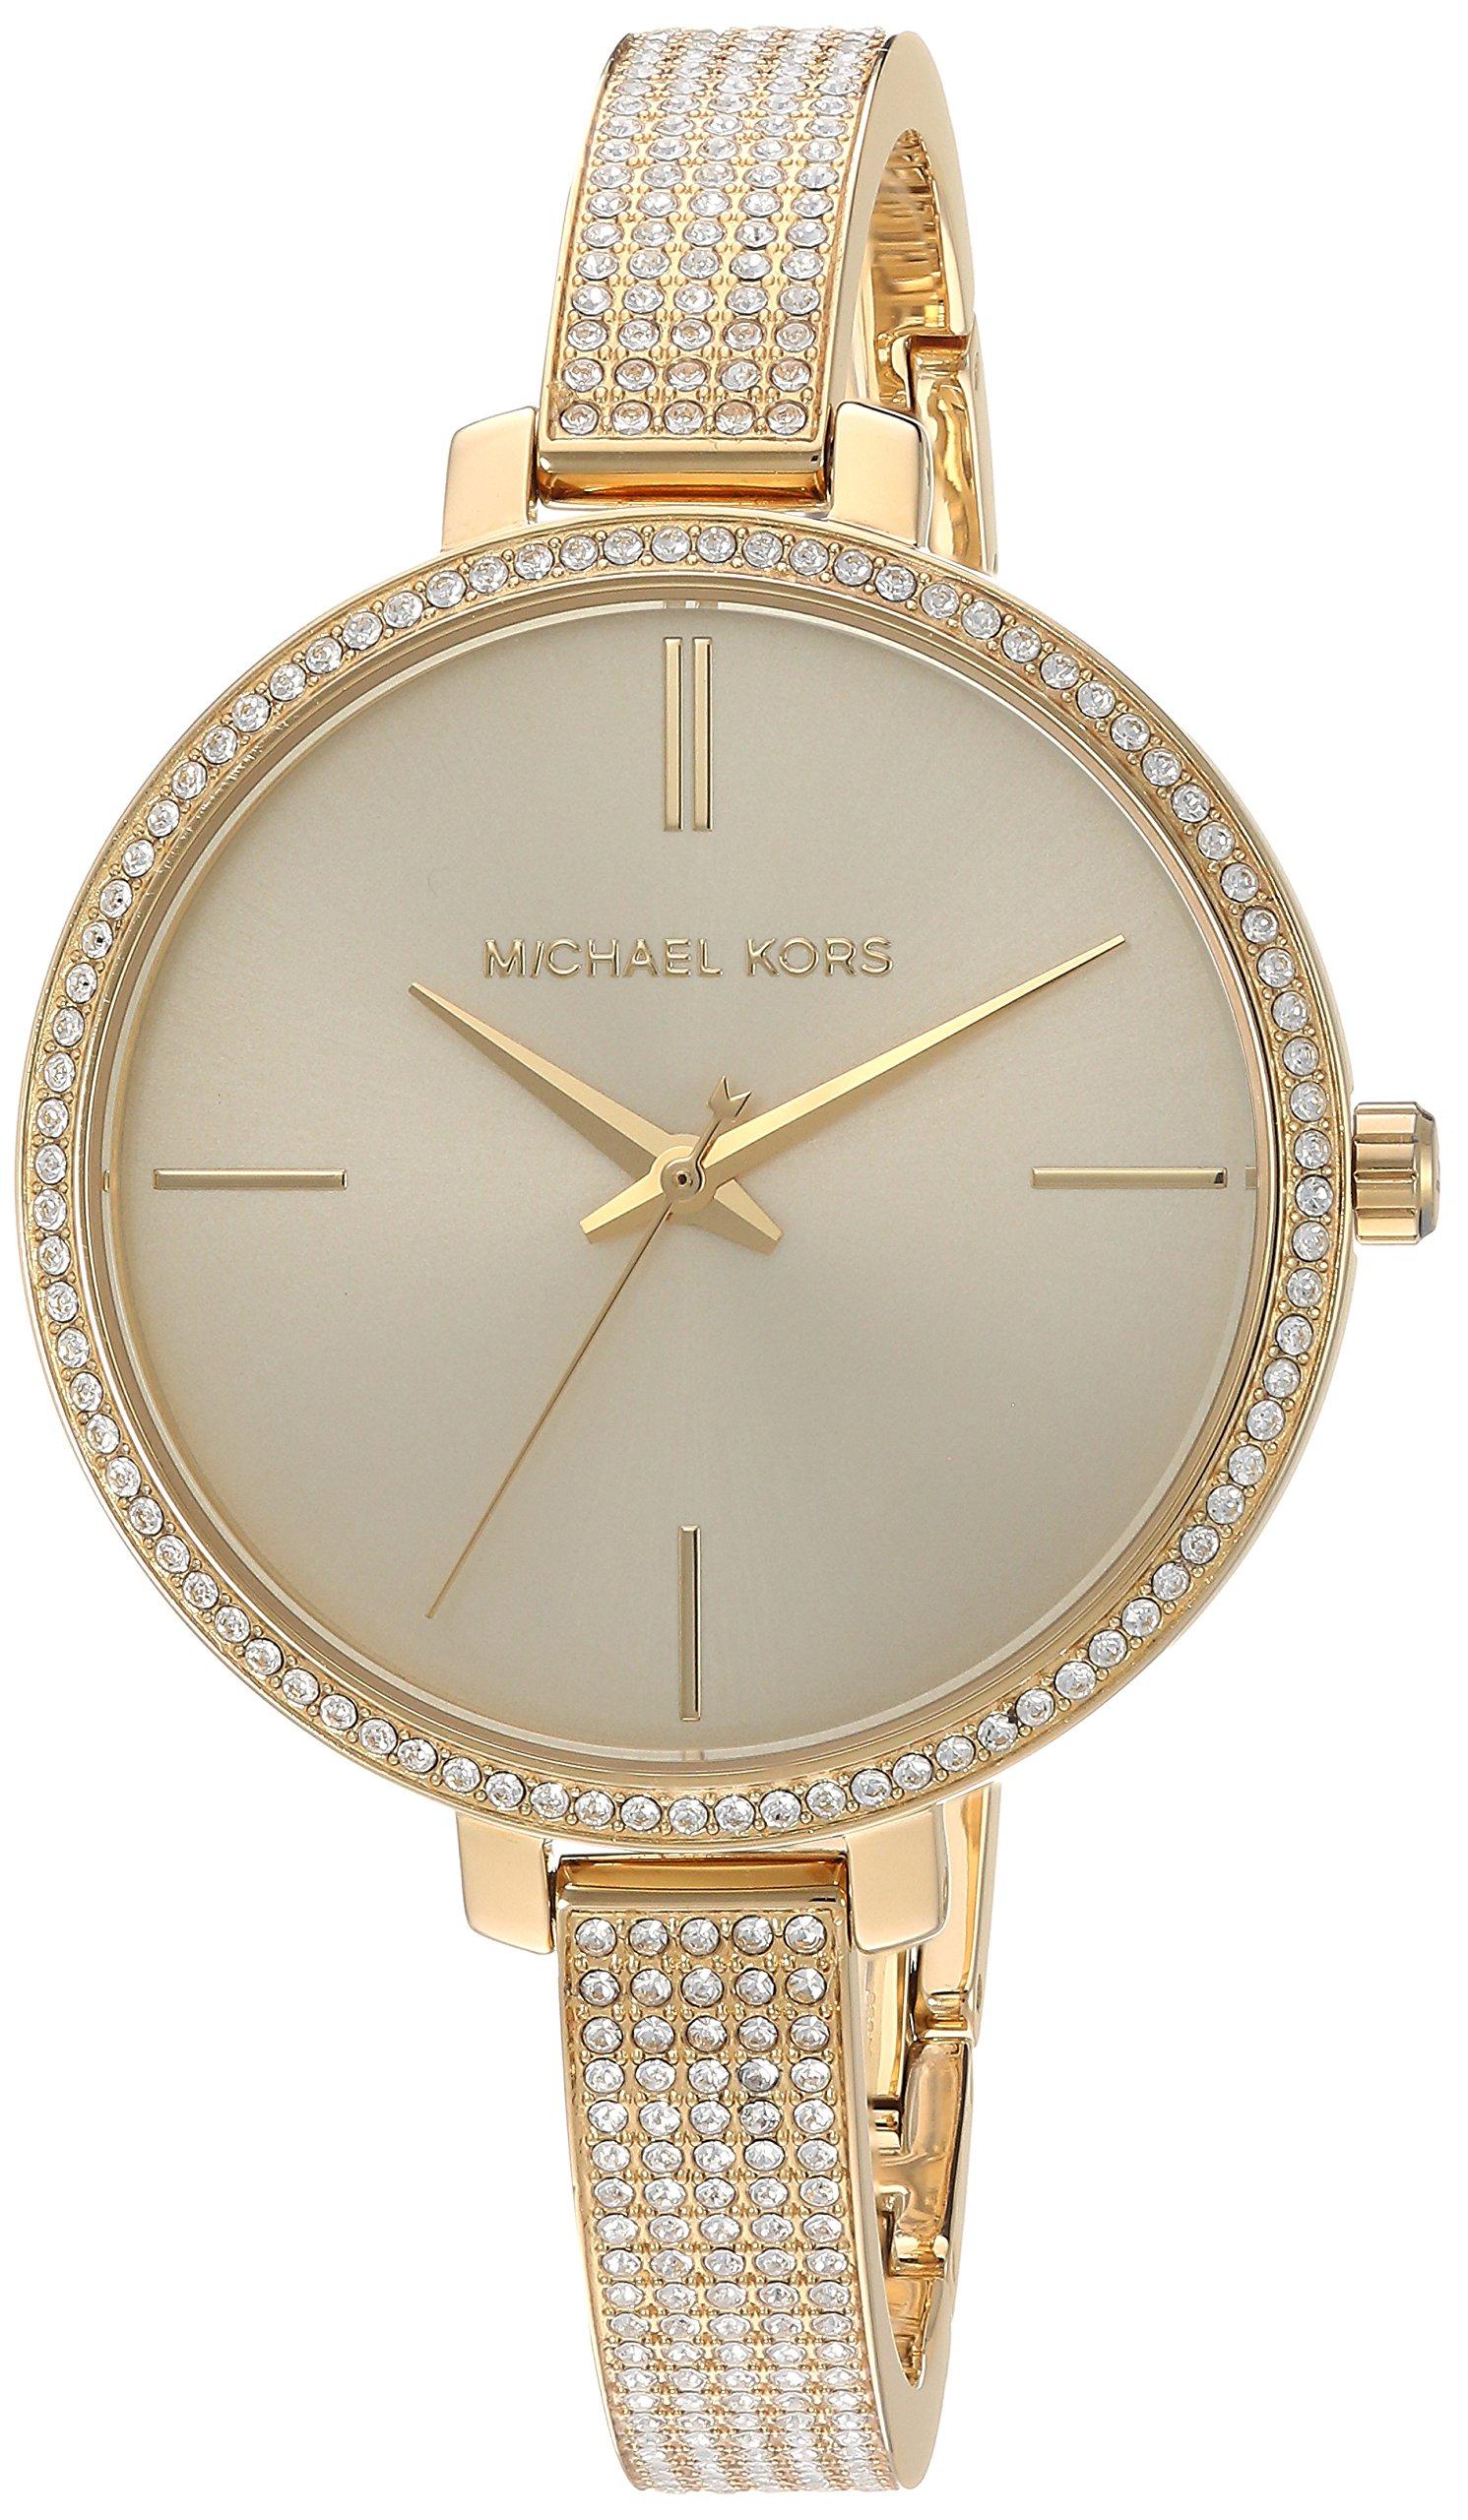 Michael Kors Women's 'Jaryn' Quartz Stainless Steel Casual Watch, Color:Gold-Toned (Model: MK3784)